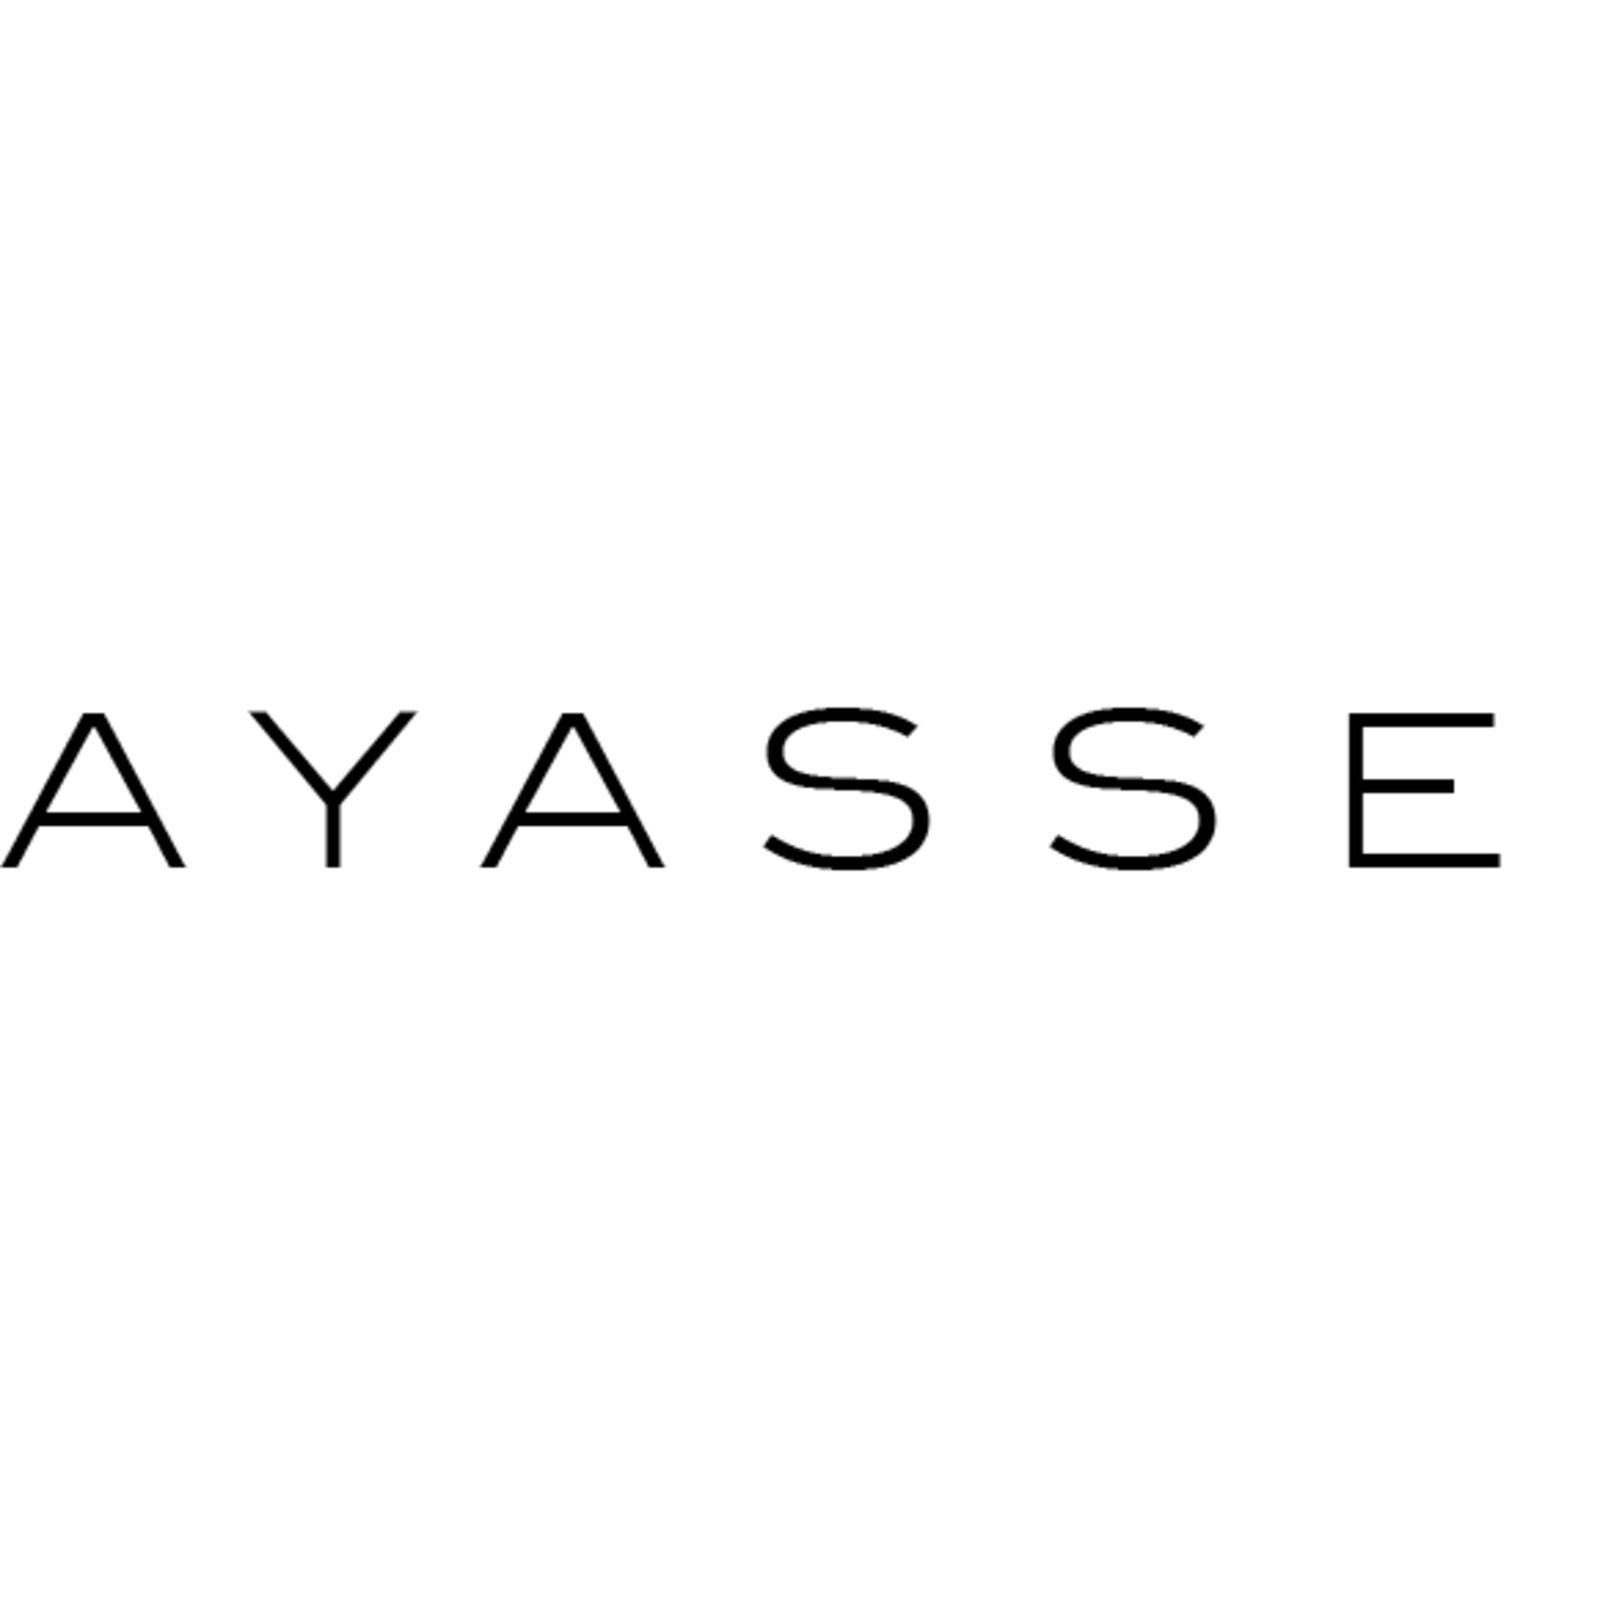 AYASSE (Bild 1)